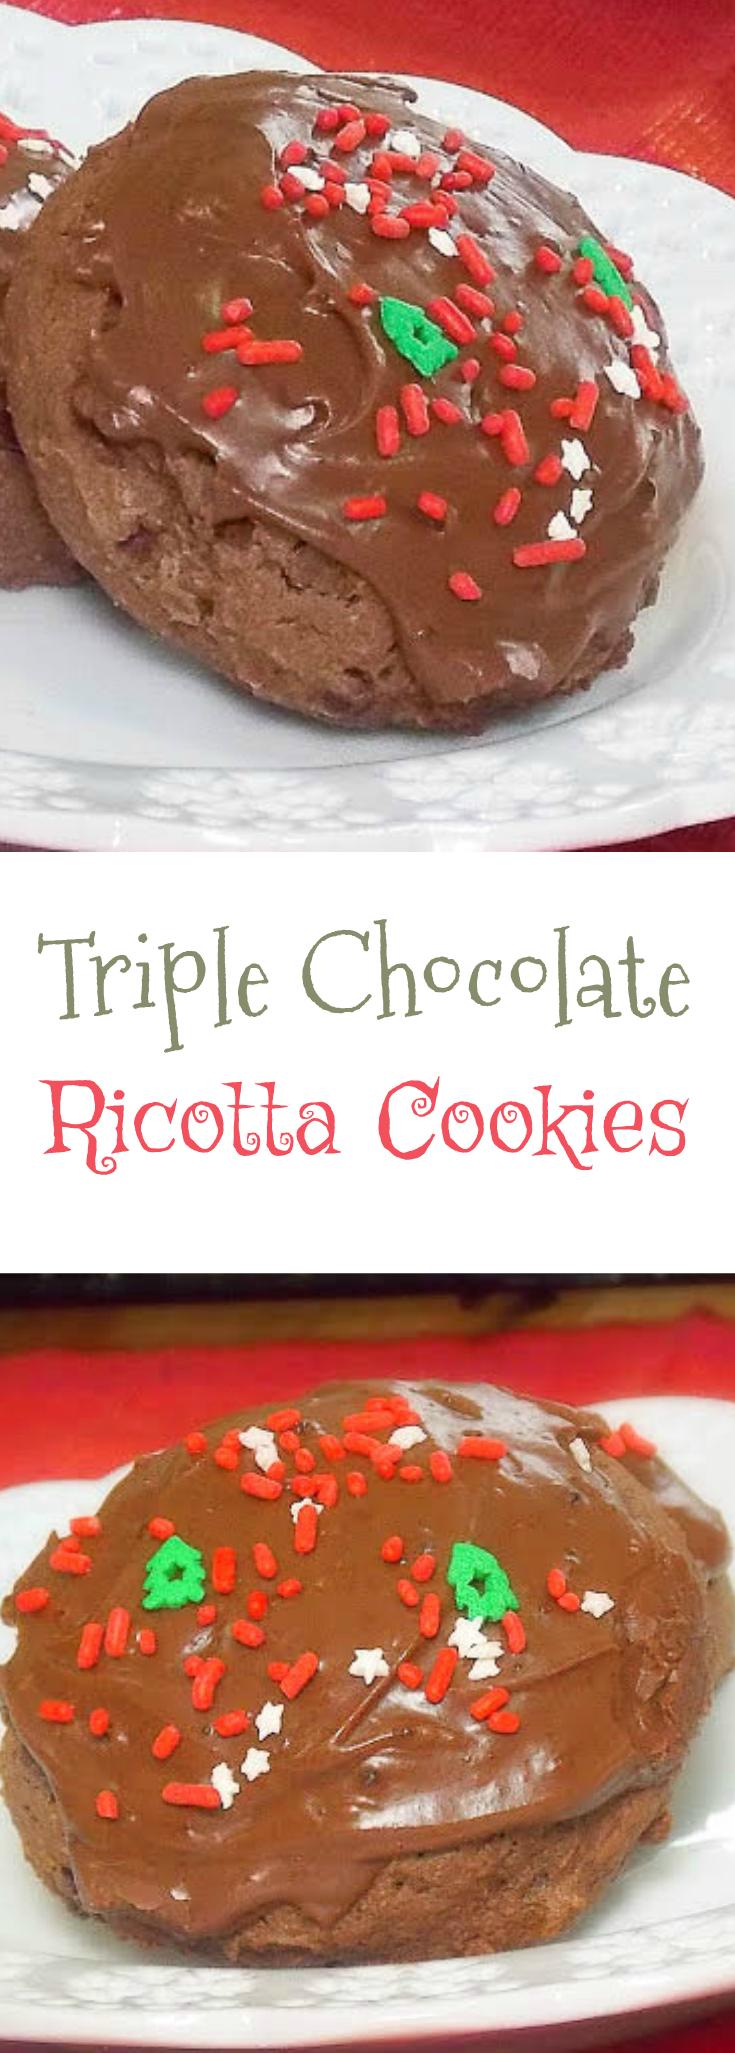 Triple Chocolate Ricotta Cookies